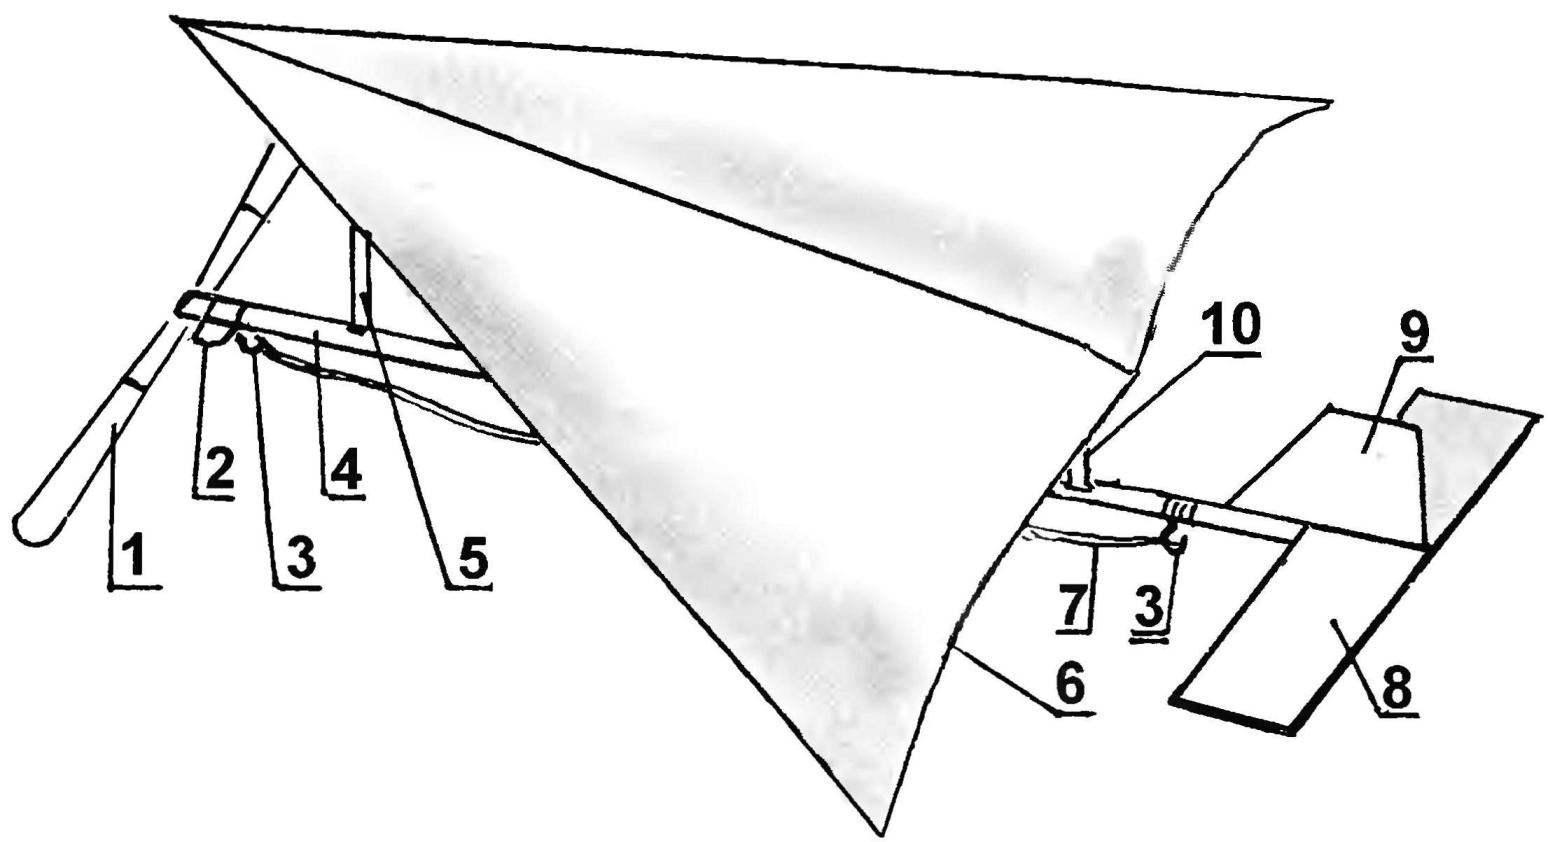 Рис. 1. Мотодельтаплан